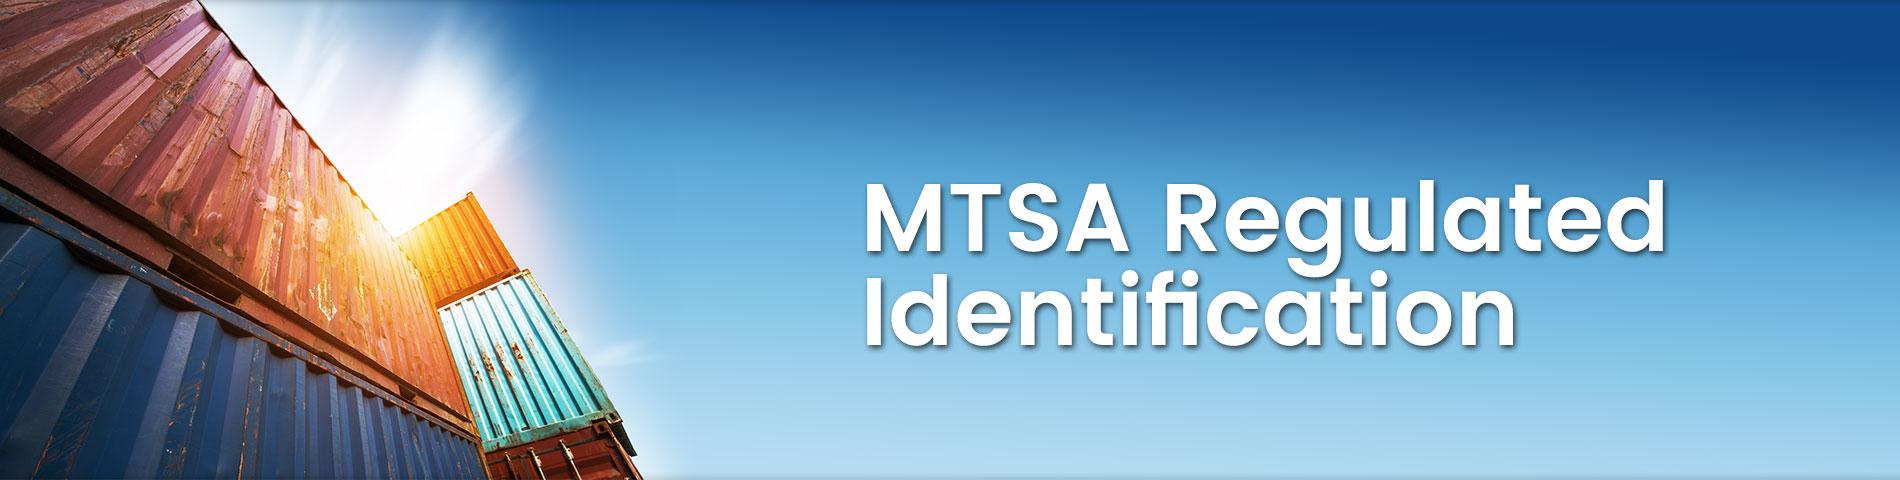 MTSA Regulated Identification